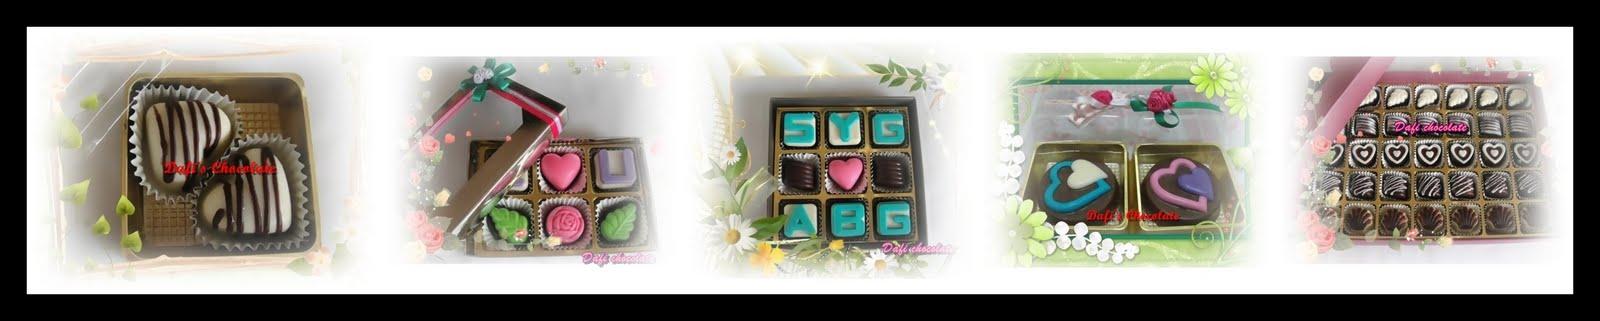 Dafi's Chocolate